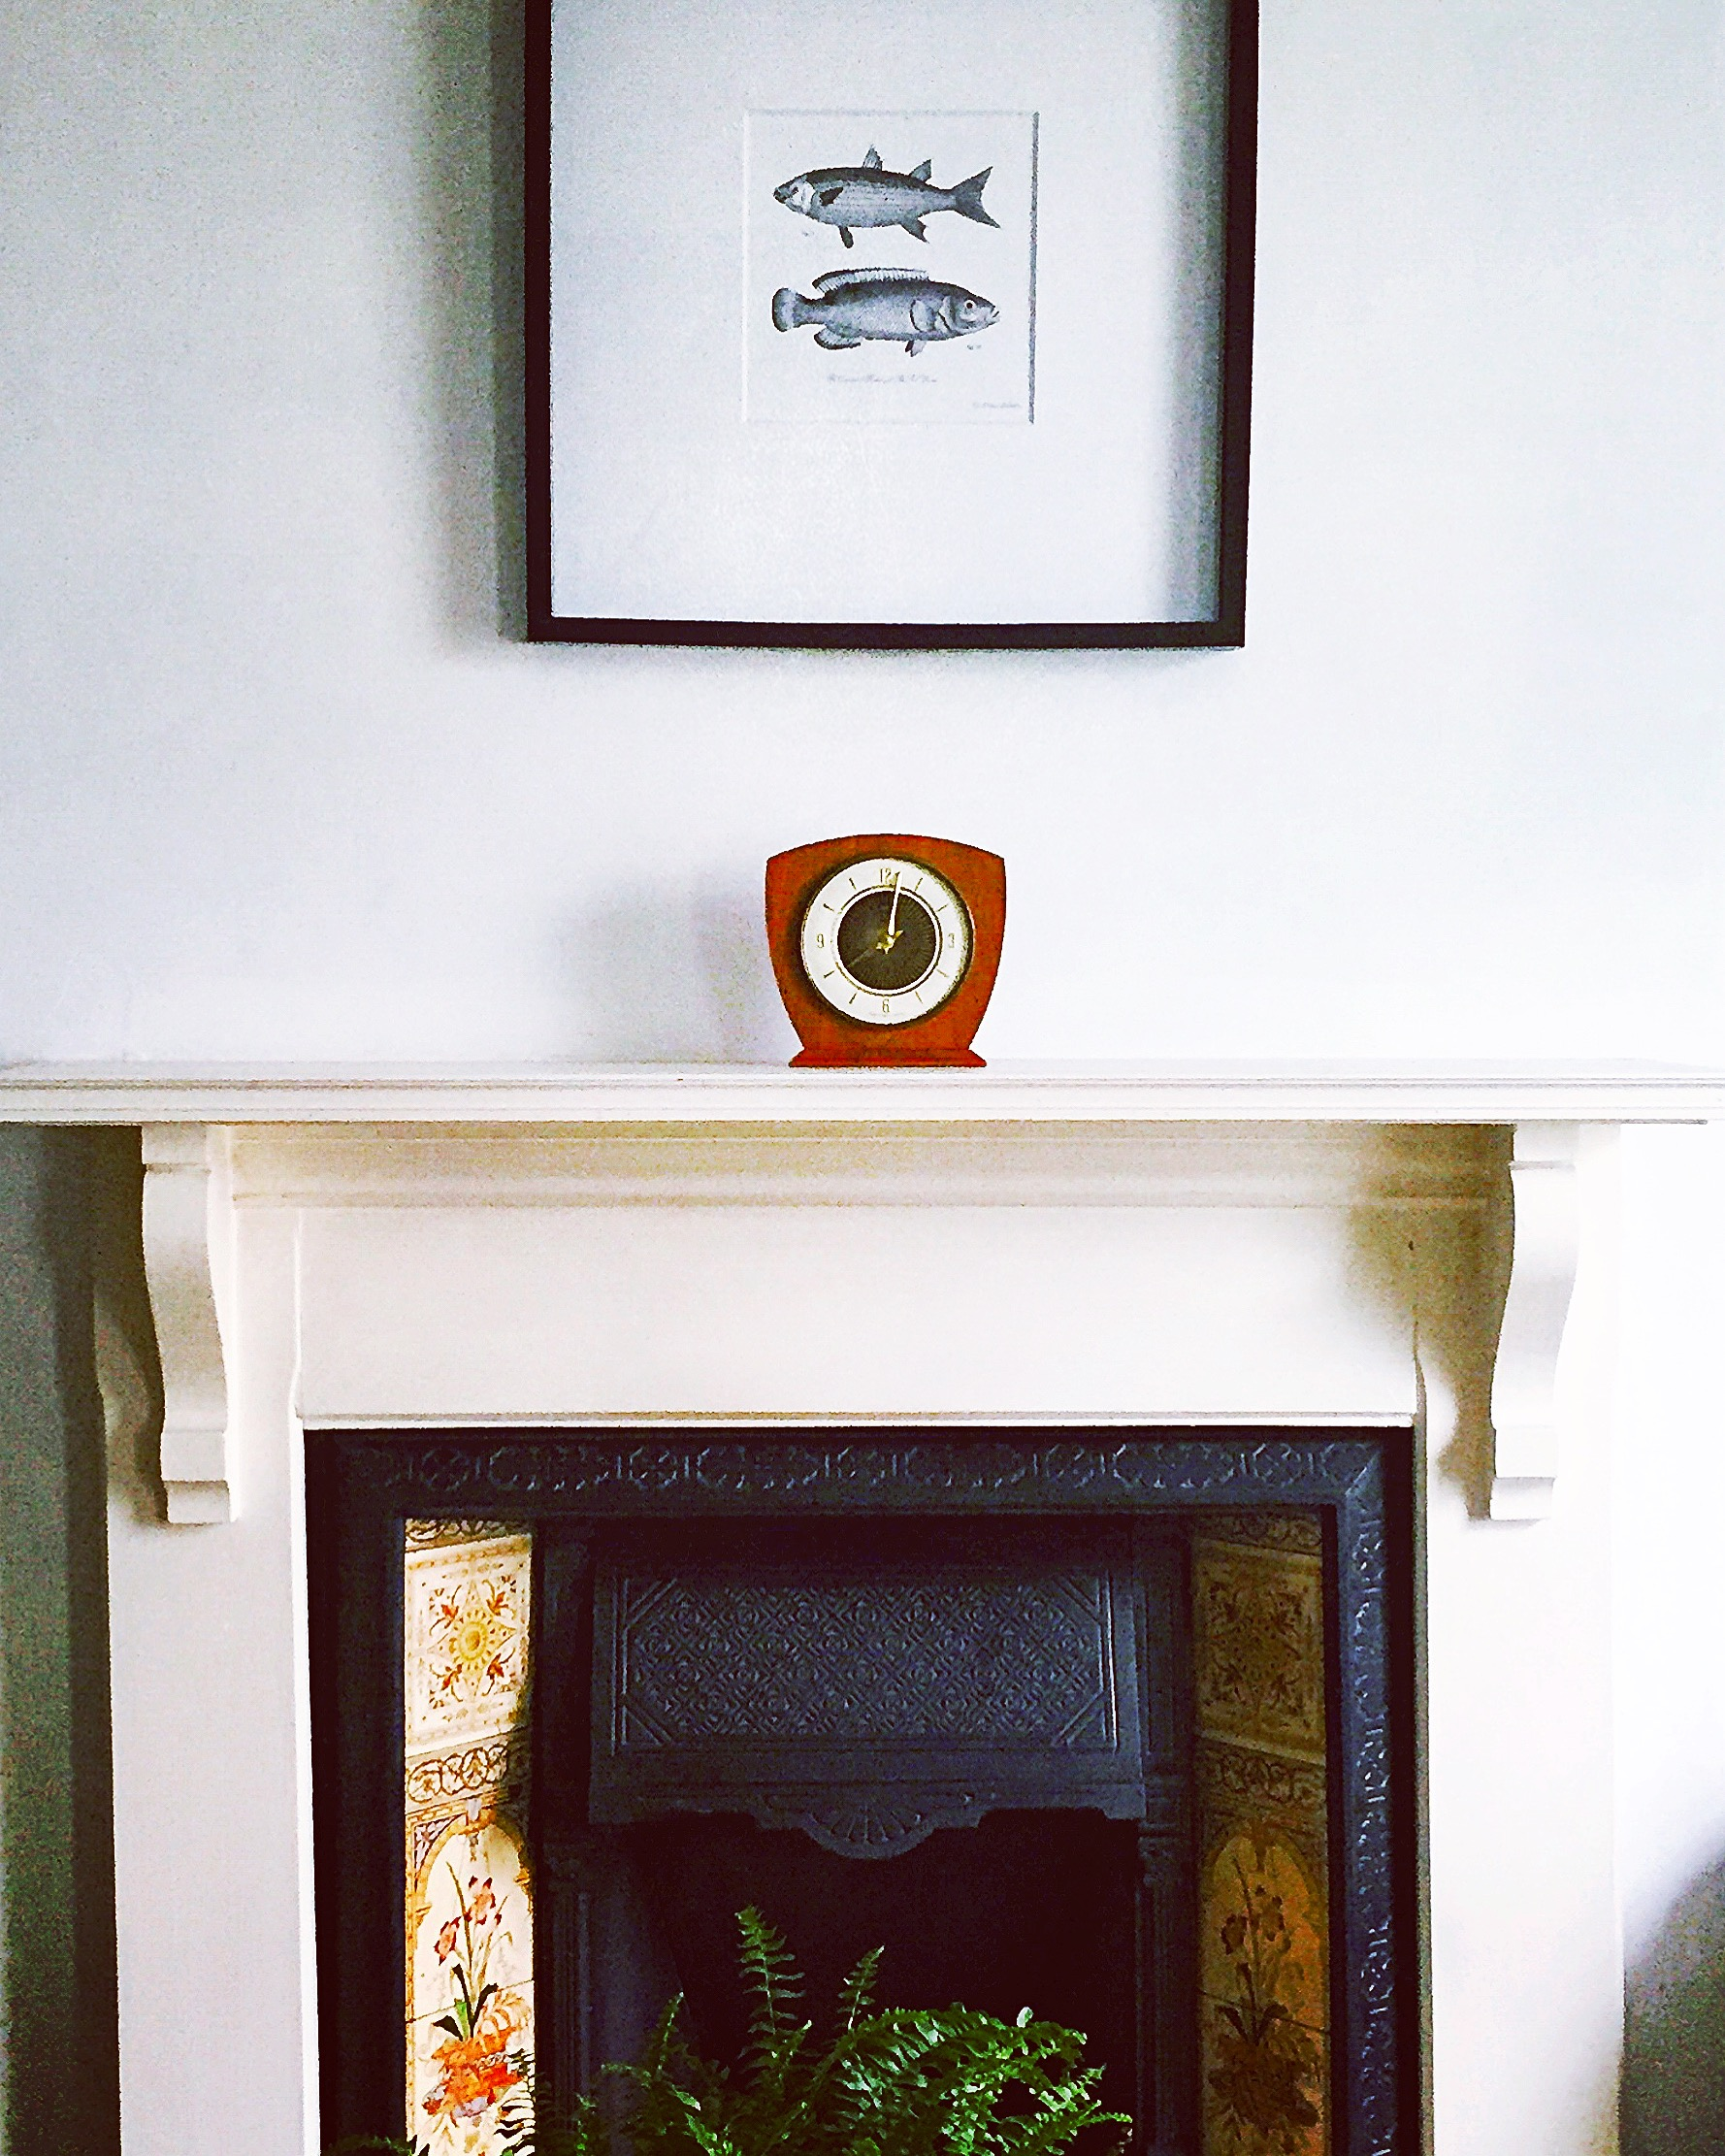 the-ink-closet-home-blog-ikea-retro-clock-mantlepiece.jpeg